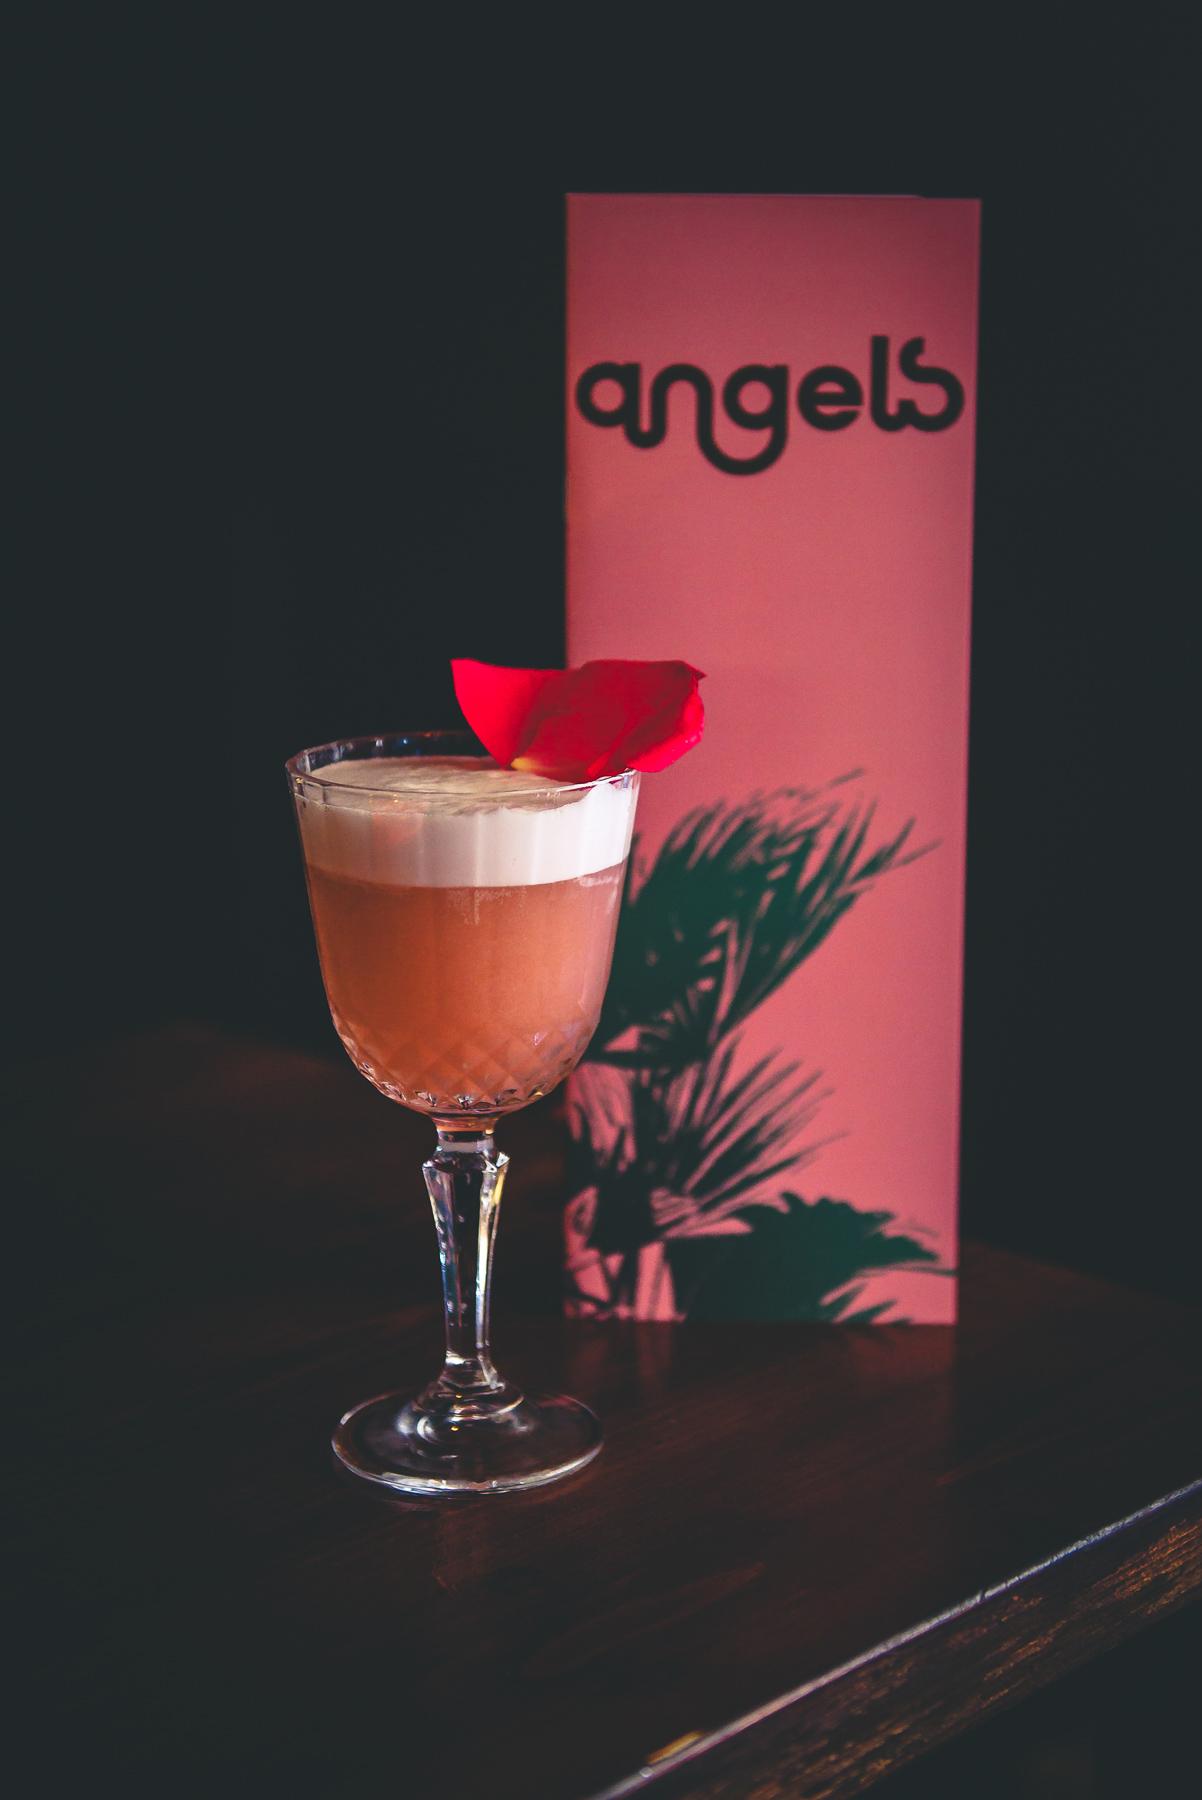 Angels cocktail bar Oxford 19.01.2019-100.jpg